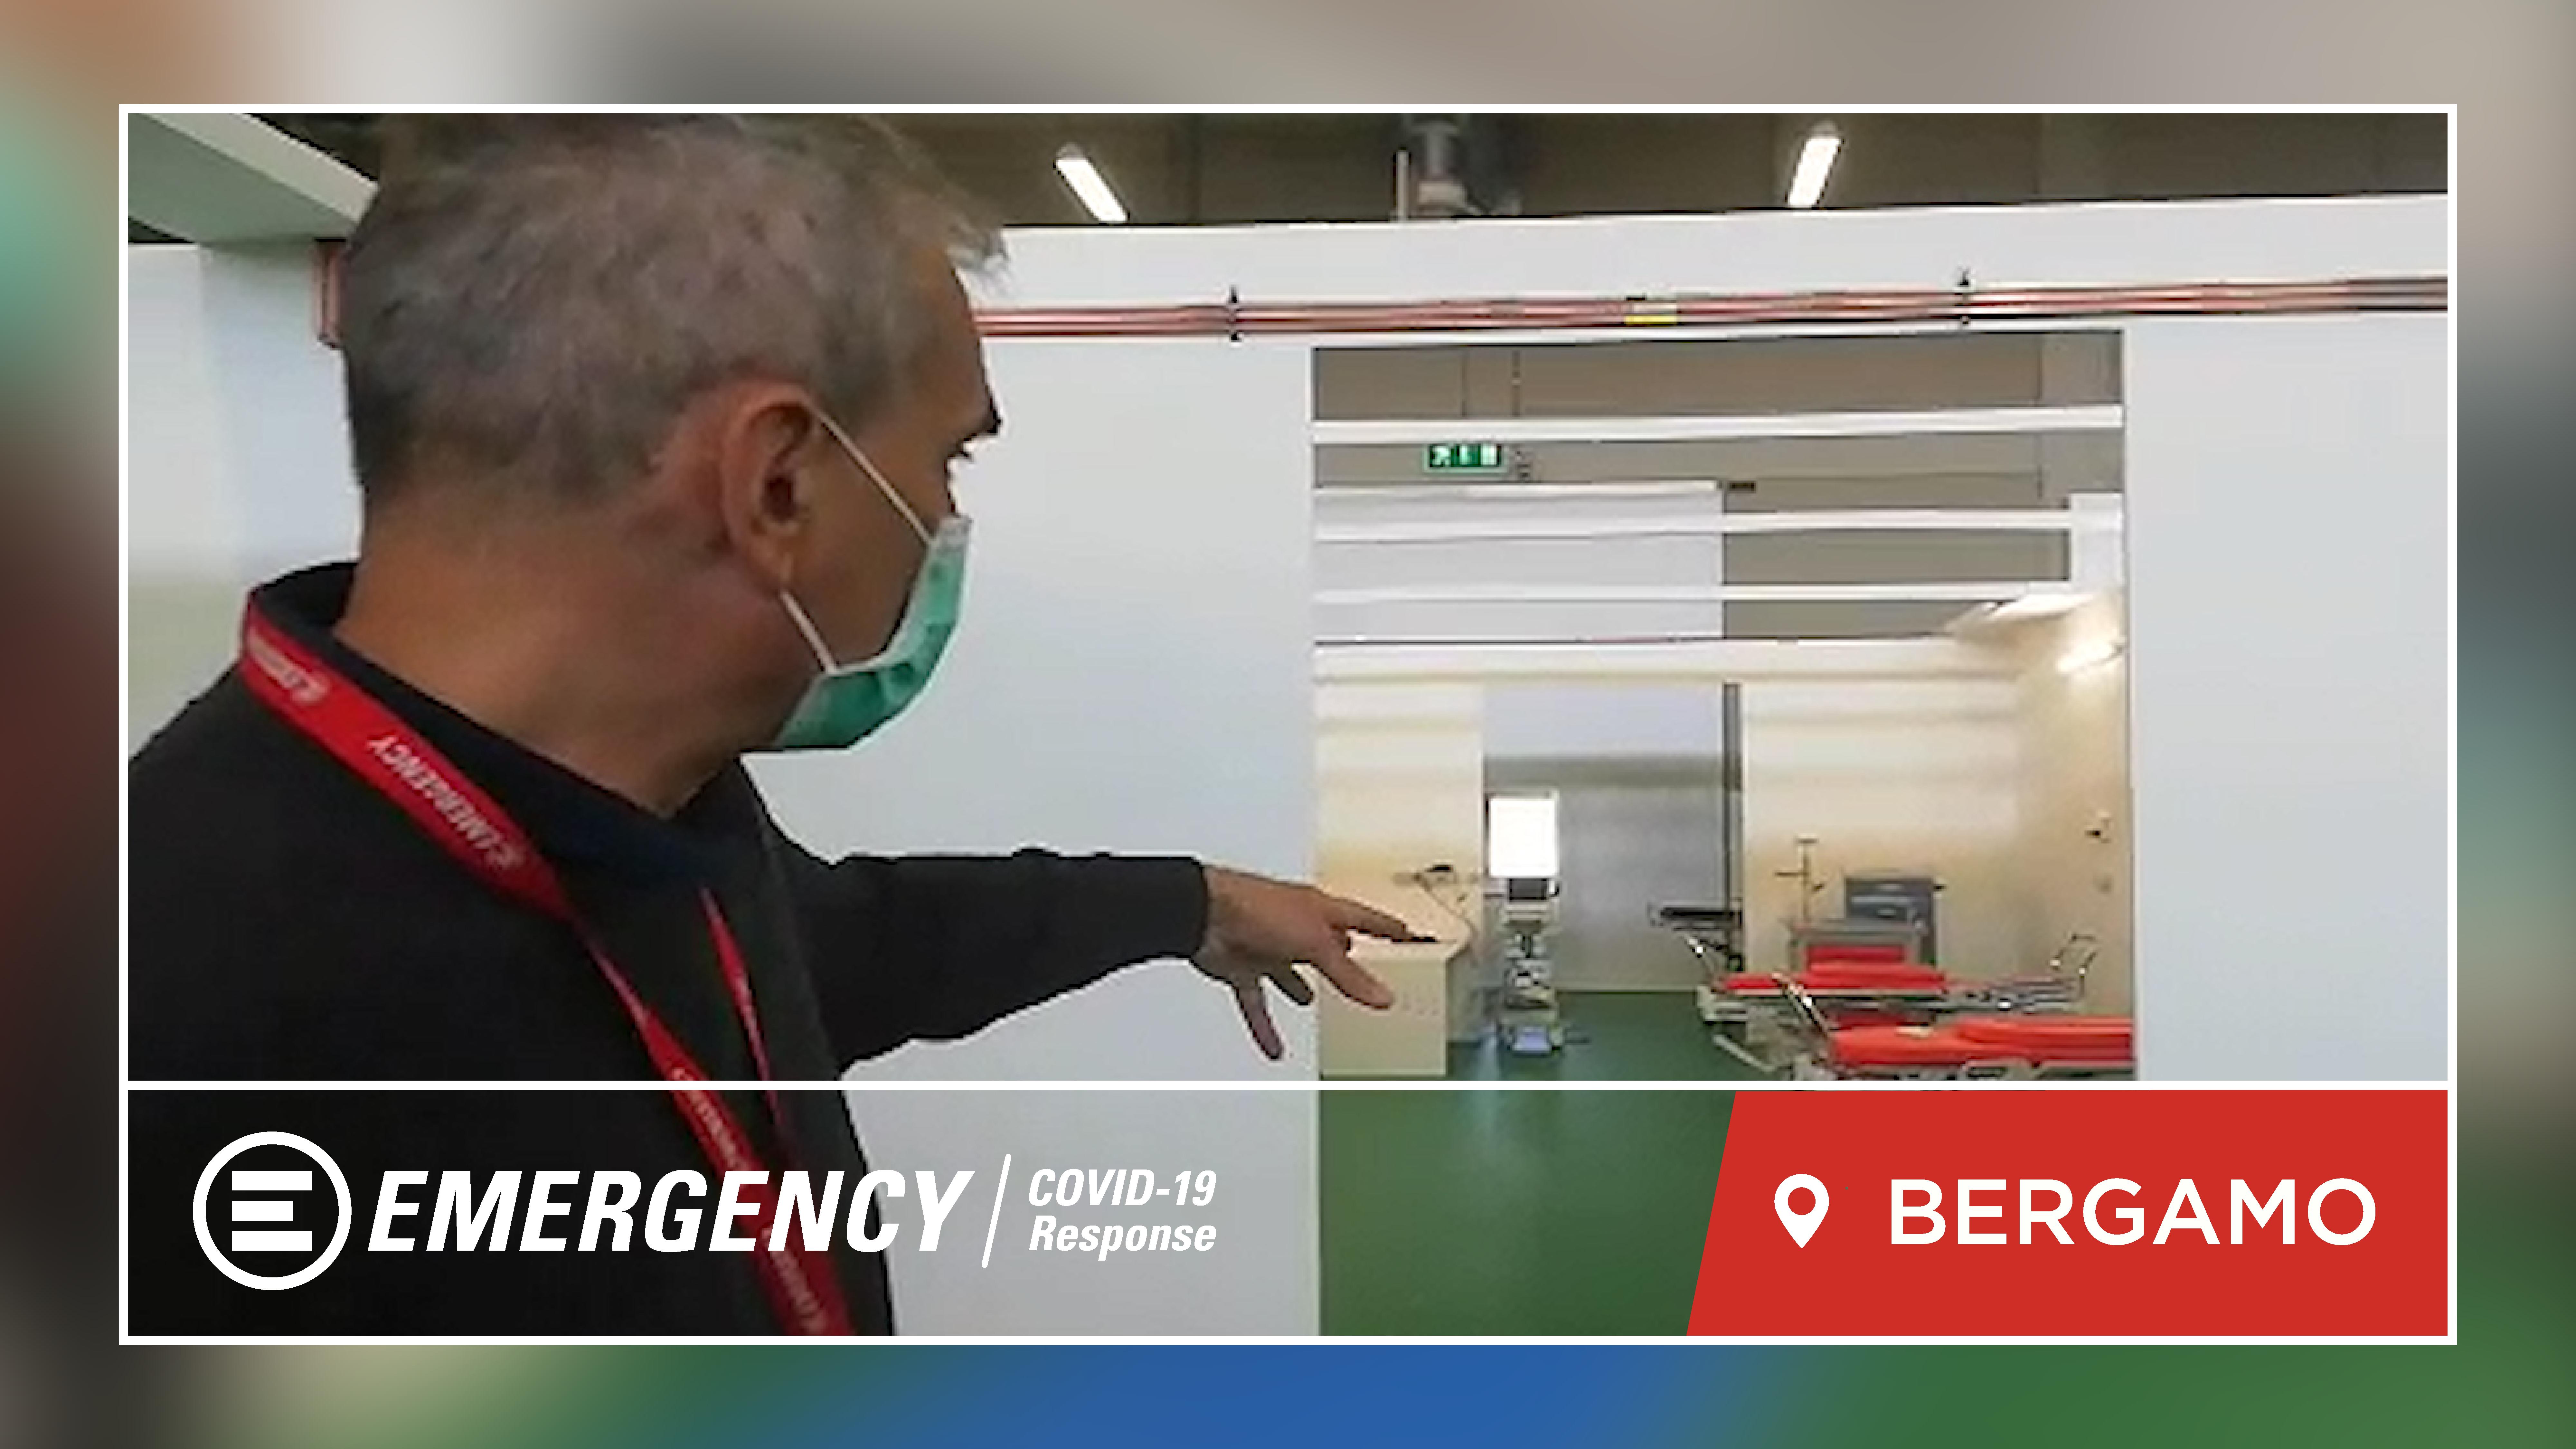 Bergamo Field Hospital: EMERGENCY Is Doing Its Bit To Combat The COVID-19